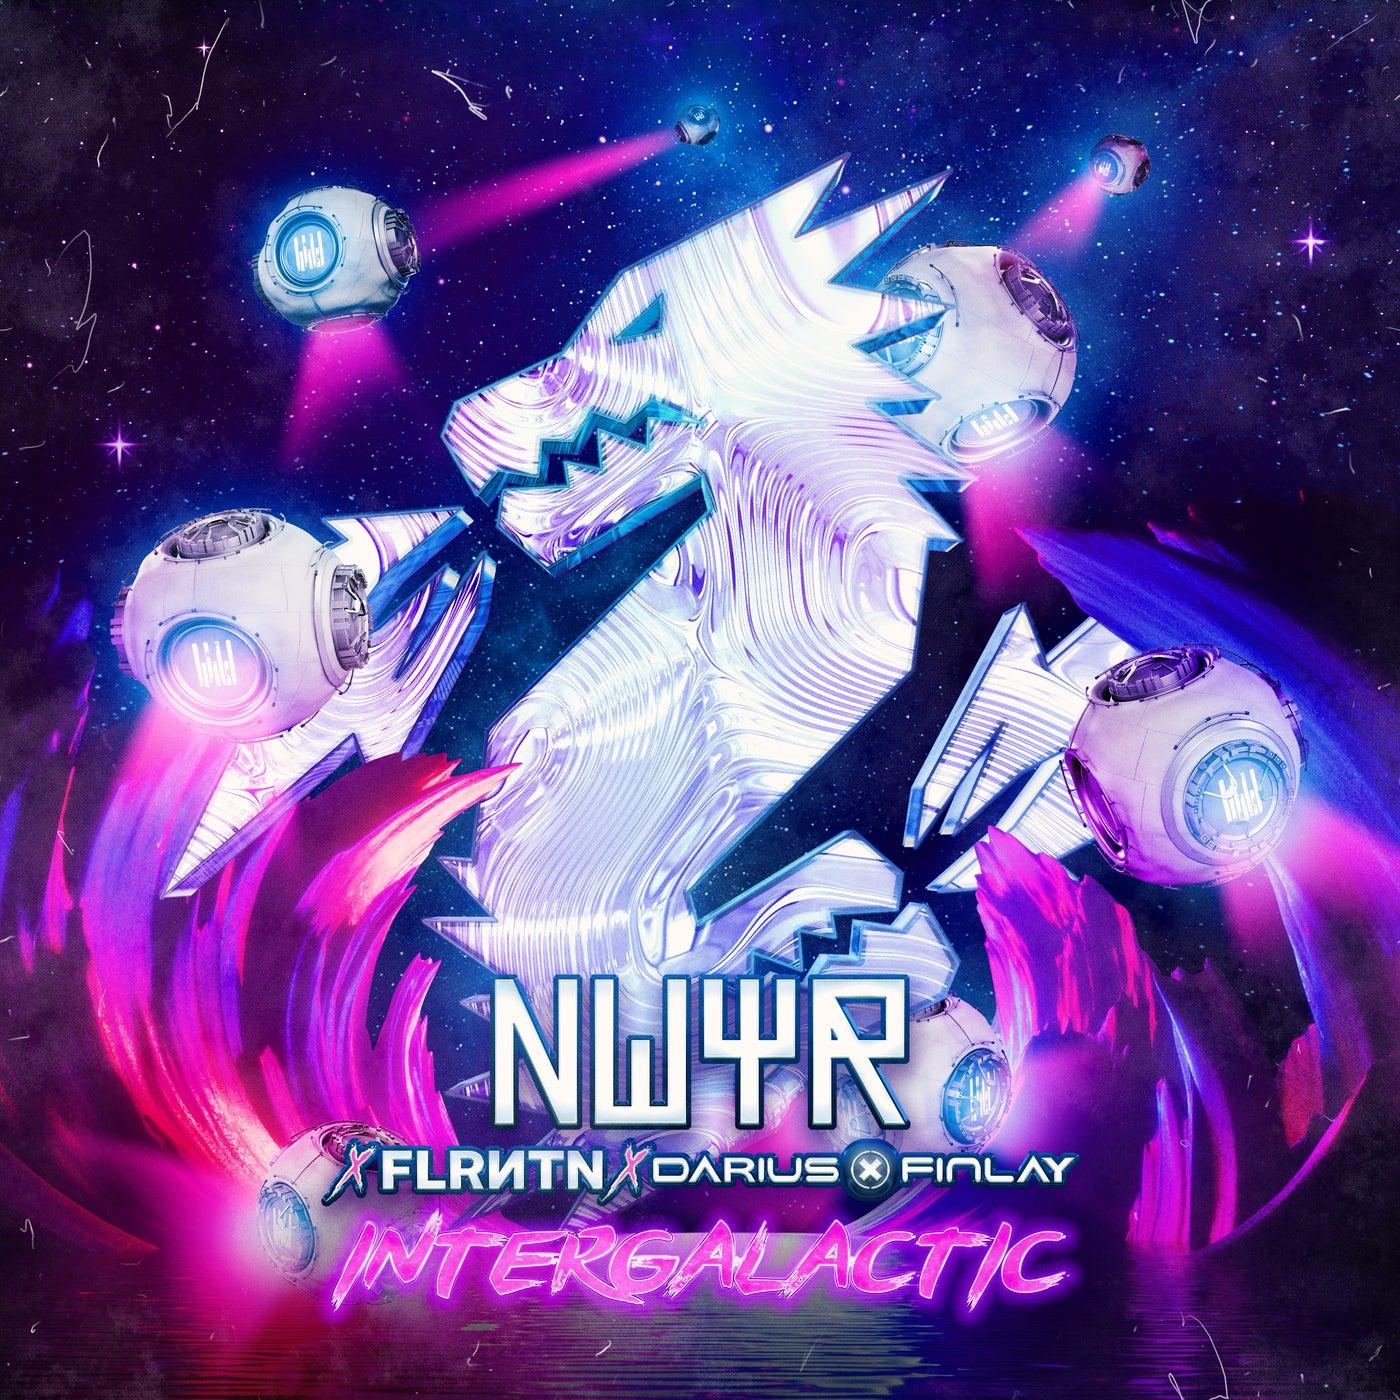 InterGalactic (Extended Mix)